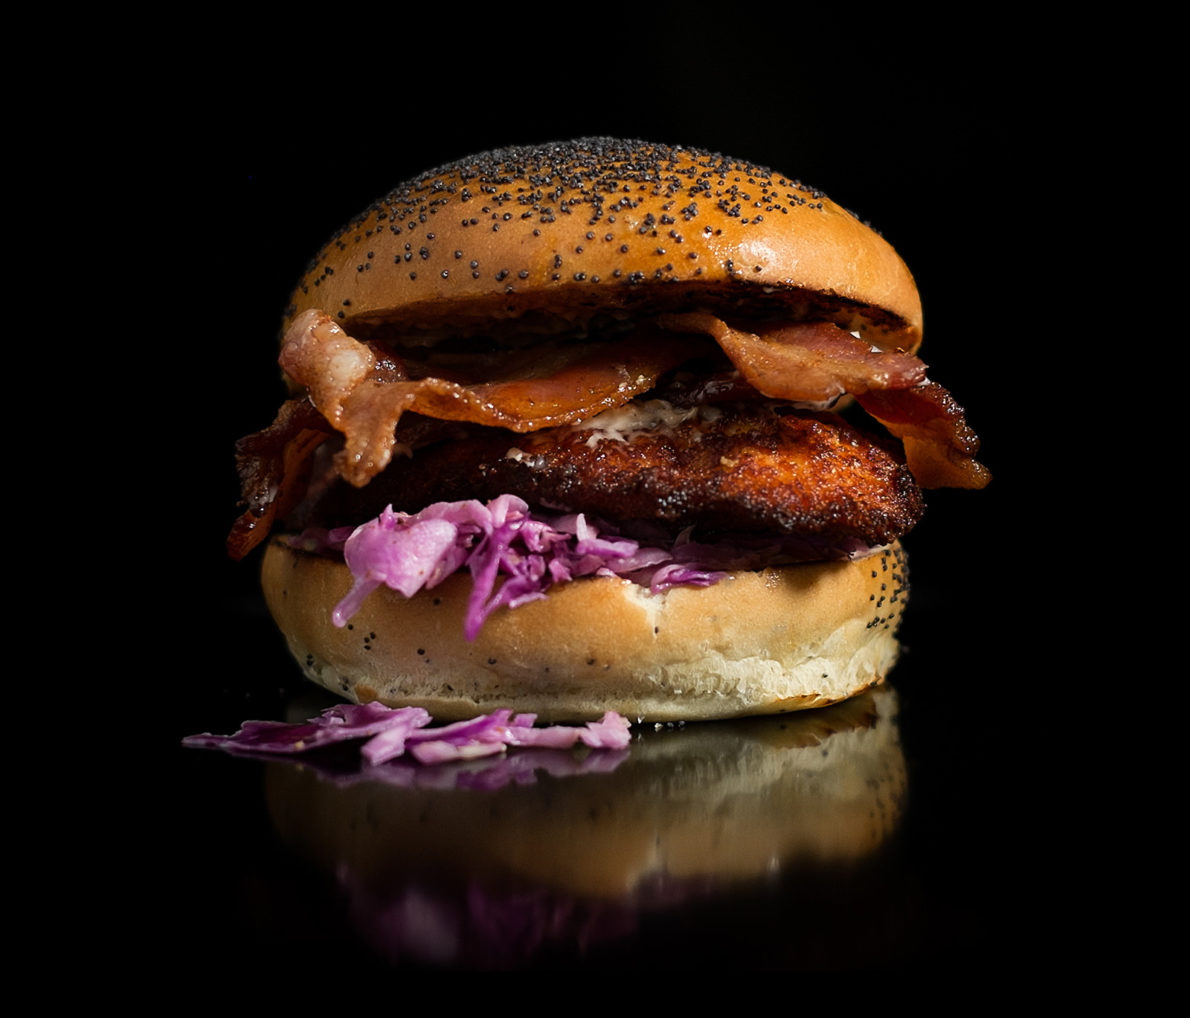 The Bacon Fried Chicken Sandwich